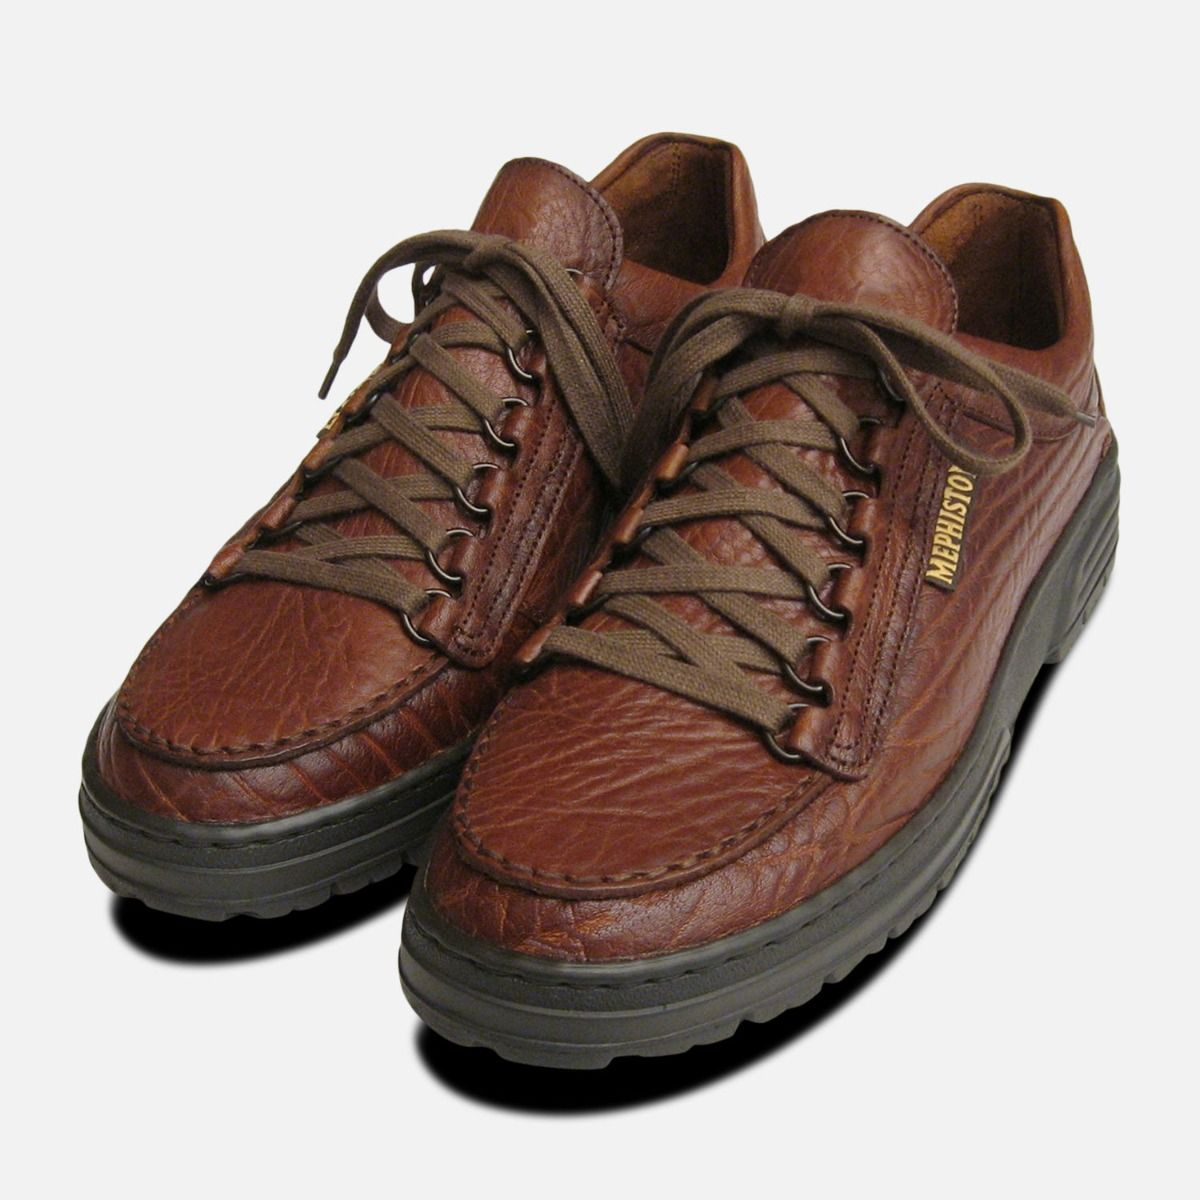 d763e1afbf Mephisto Shoes Cruiser 2 Brown Desert